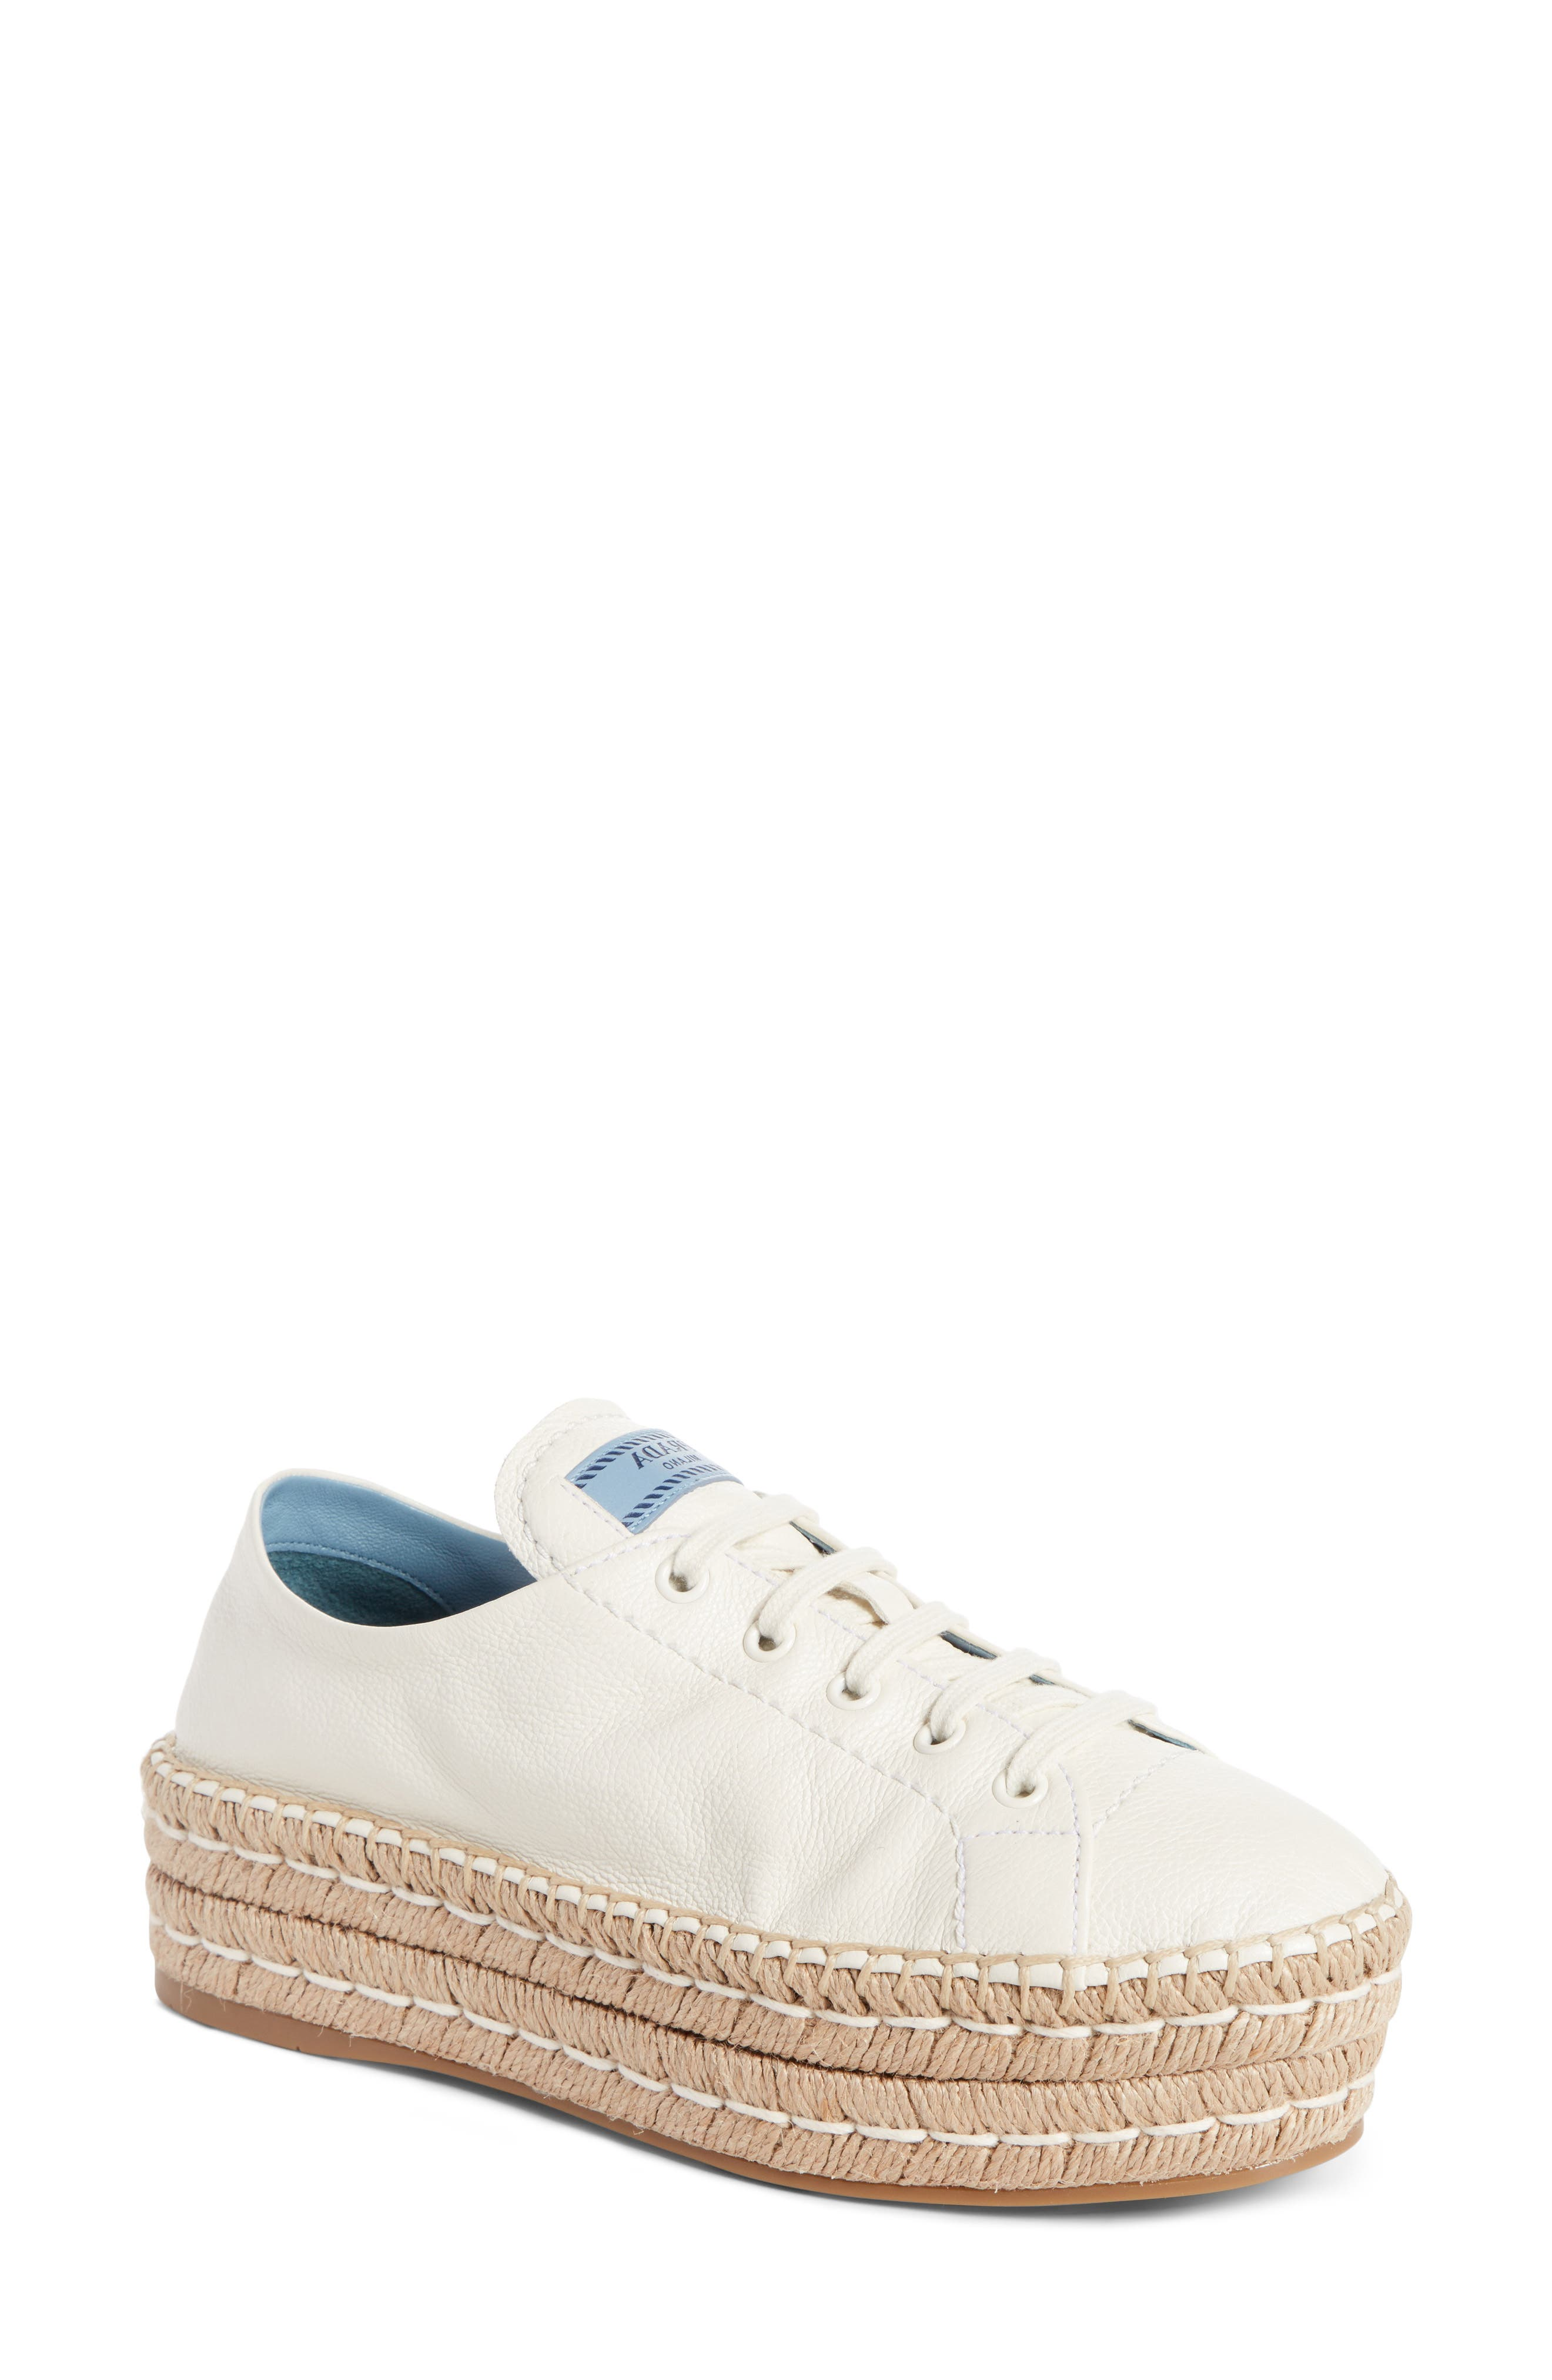 Flatform Espadrille Sneaker,                         Main,                         color, White